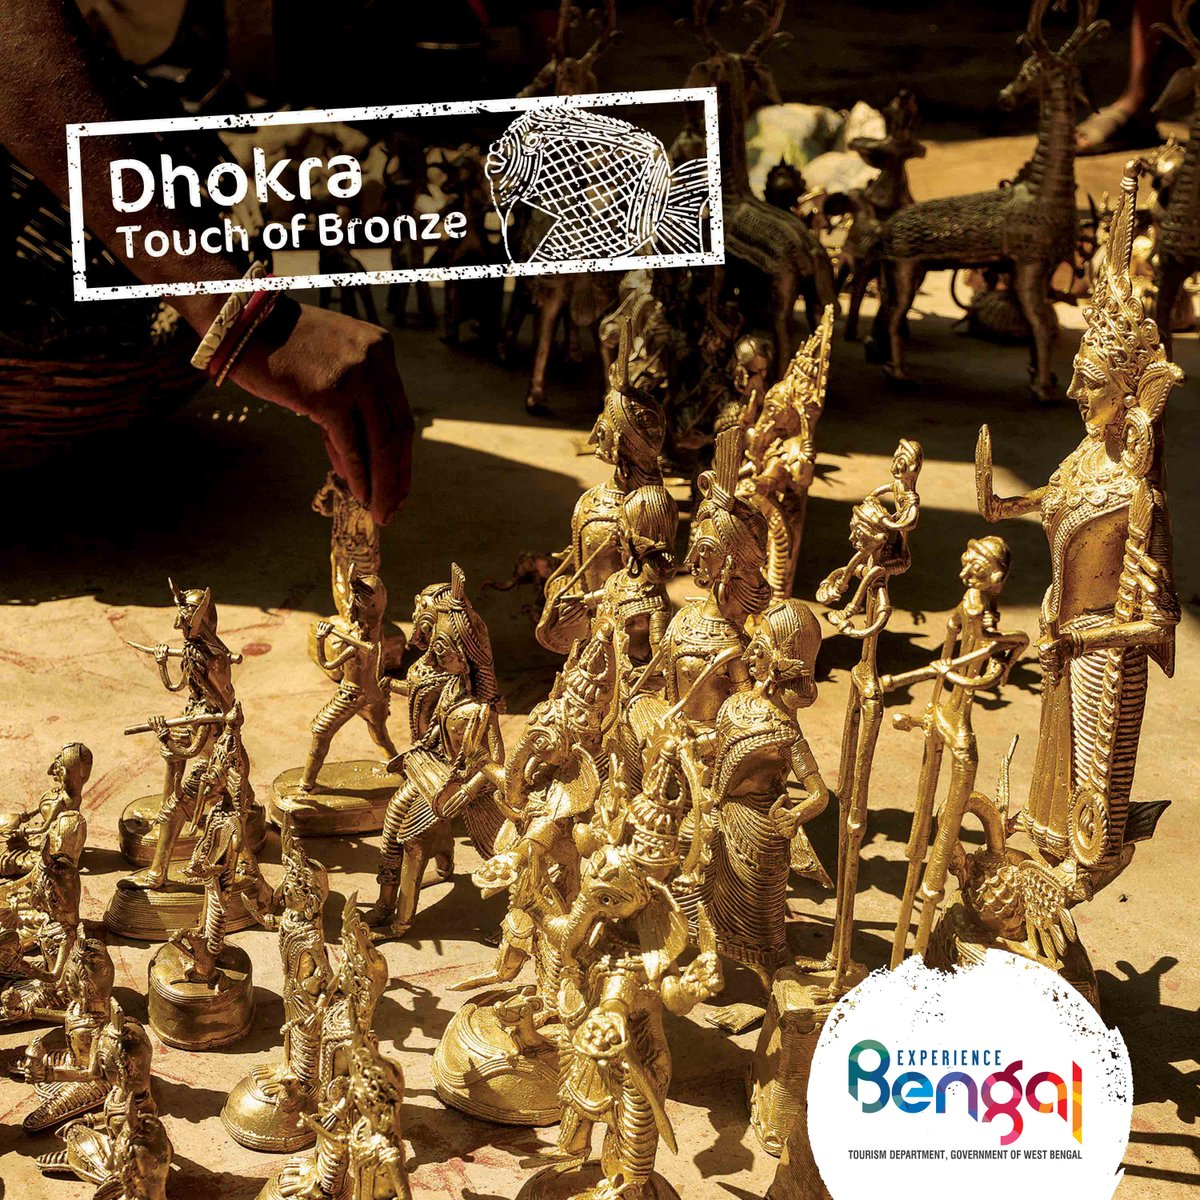 Dhokra: a 4000 year old craftsmanship! Witness the beautiful craft of Bengal at http://bit.ly/2QNvSZk  #ExperienceBengal #BengalTourism #Dhokrapic.twitter.com/hDu6fzHmp1